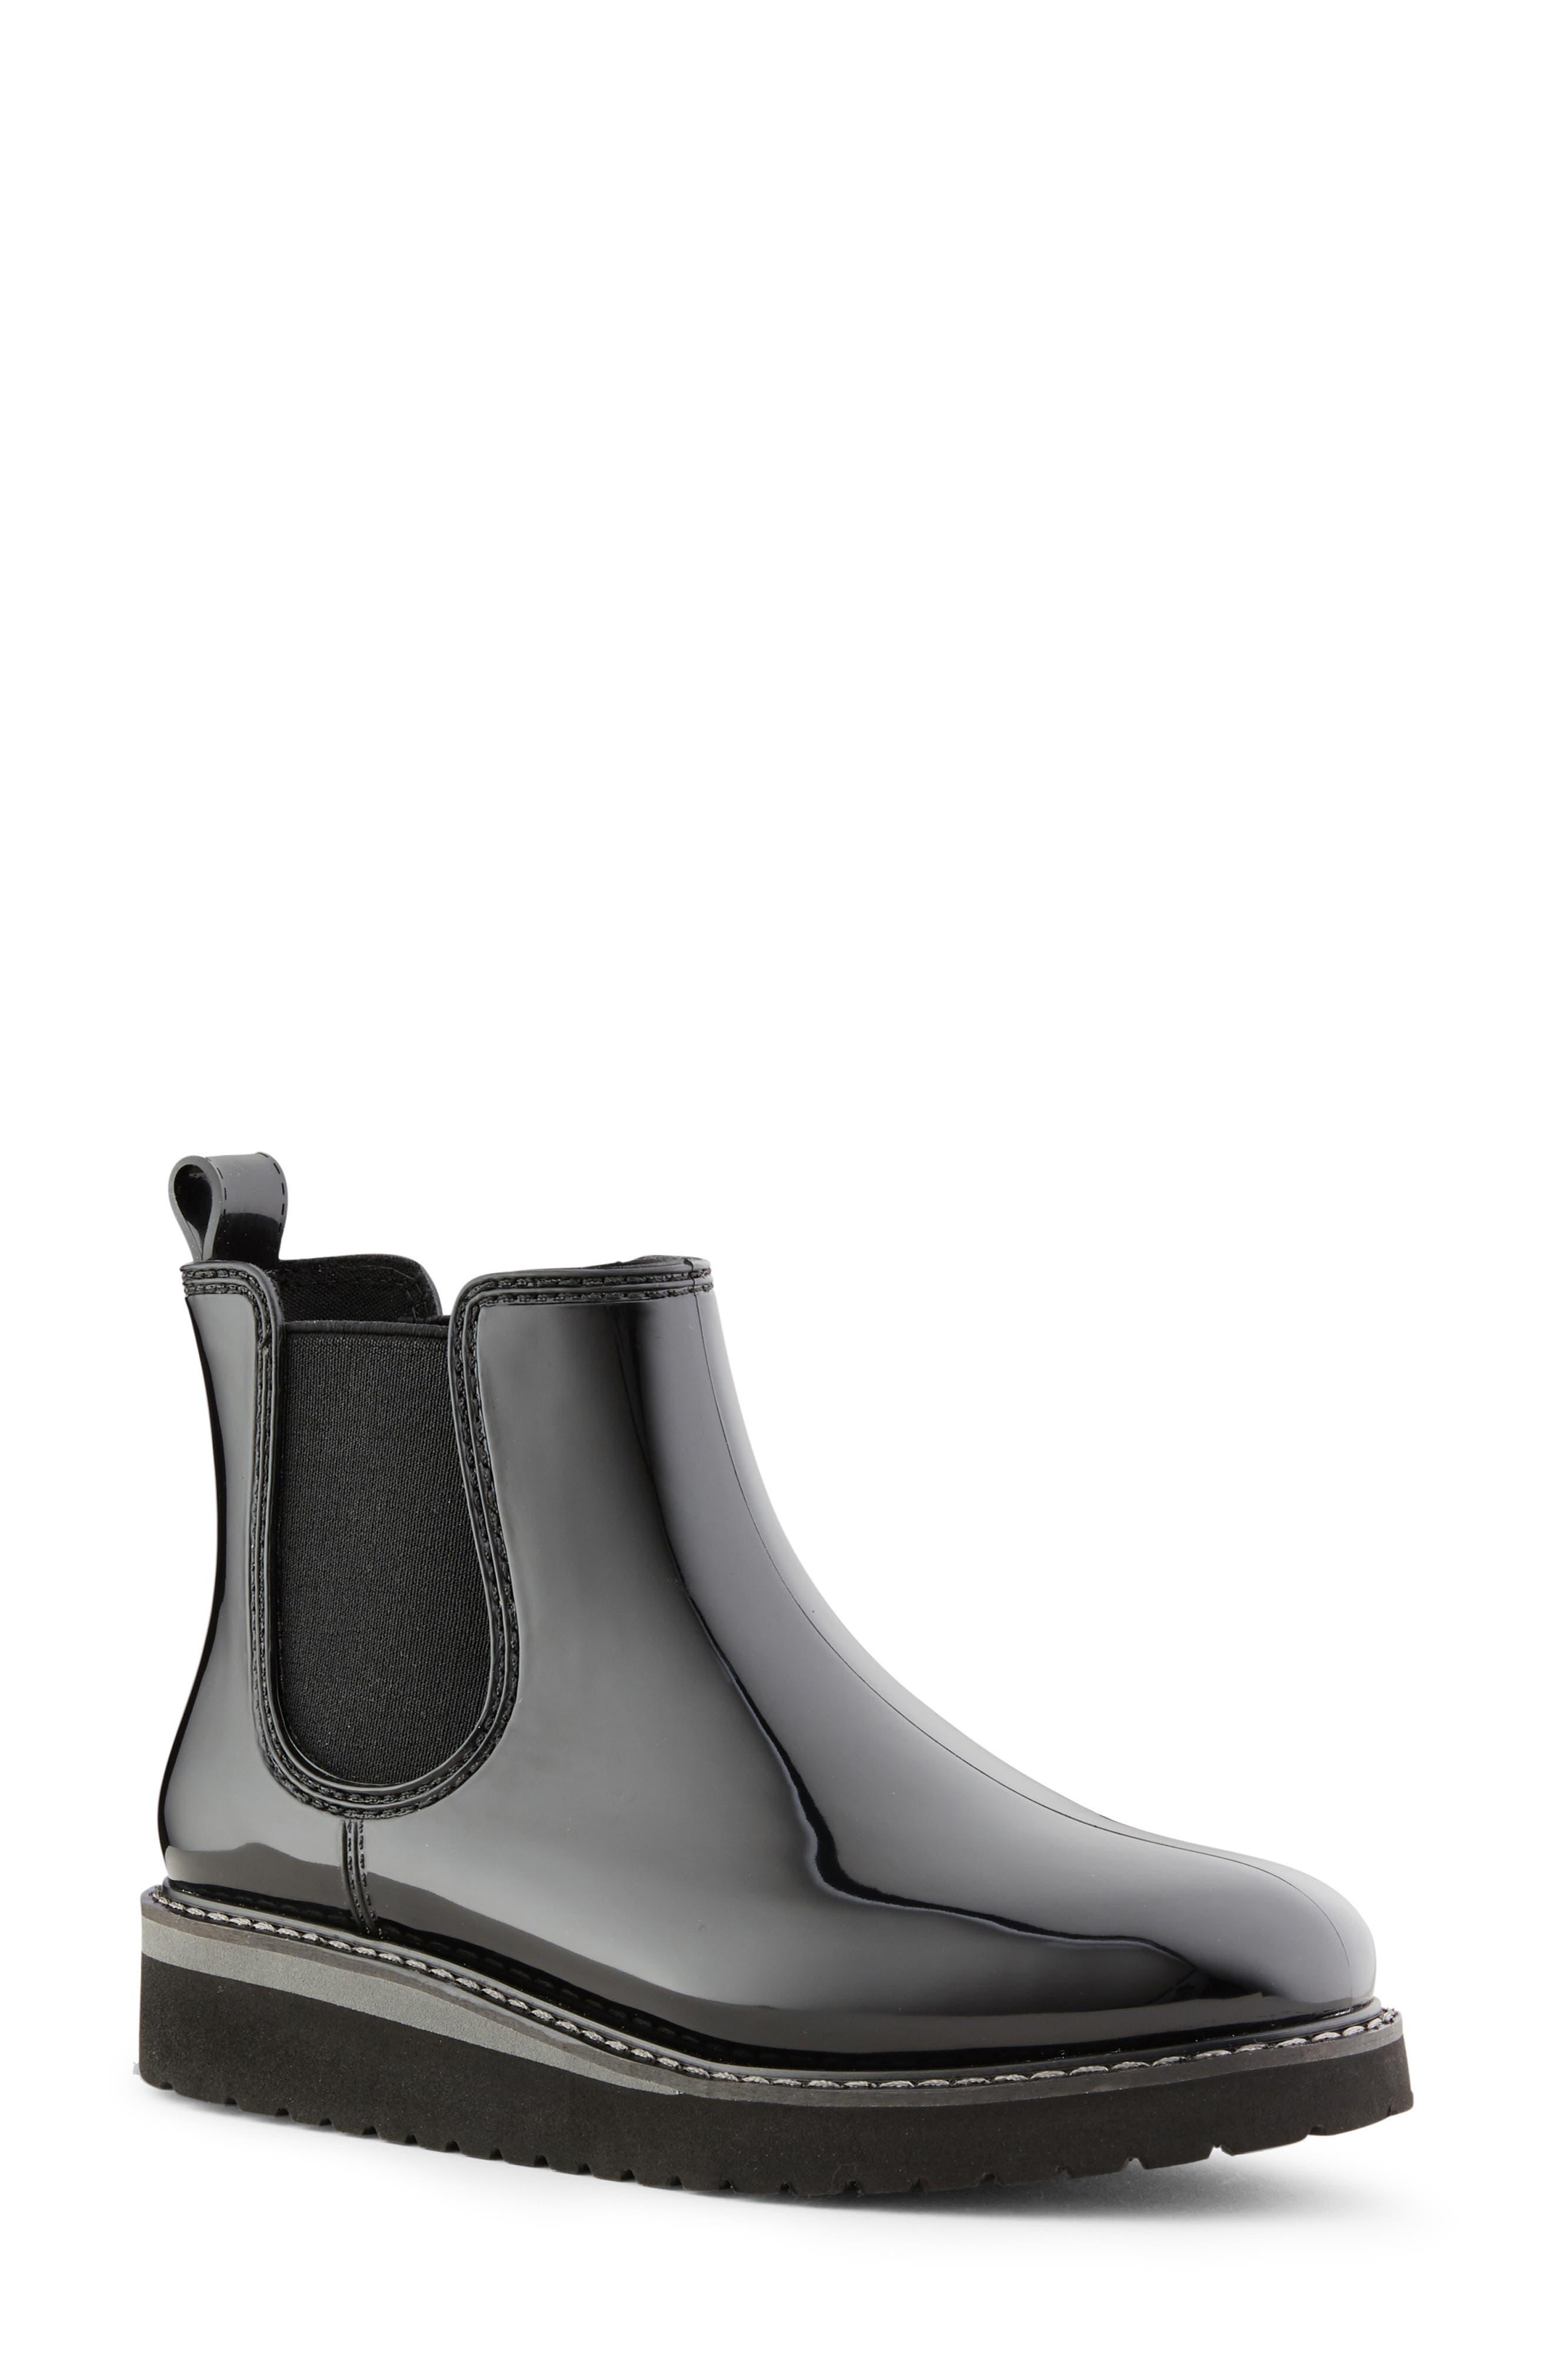 Kensington Chelsea Rain Boot, Main, color, BLACK/ CHARCOAL